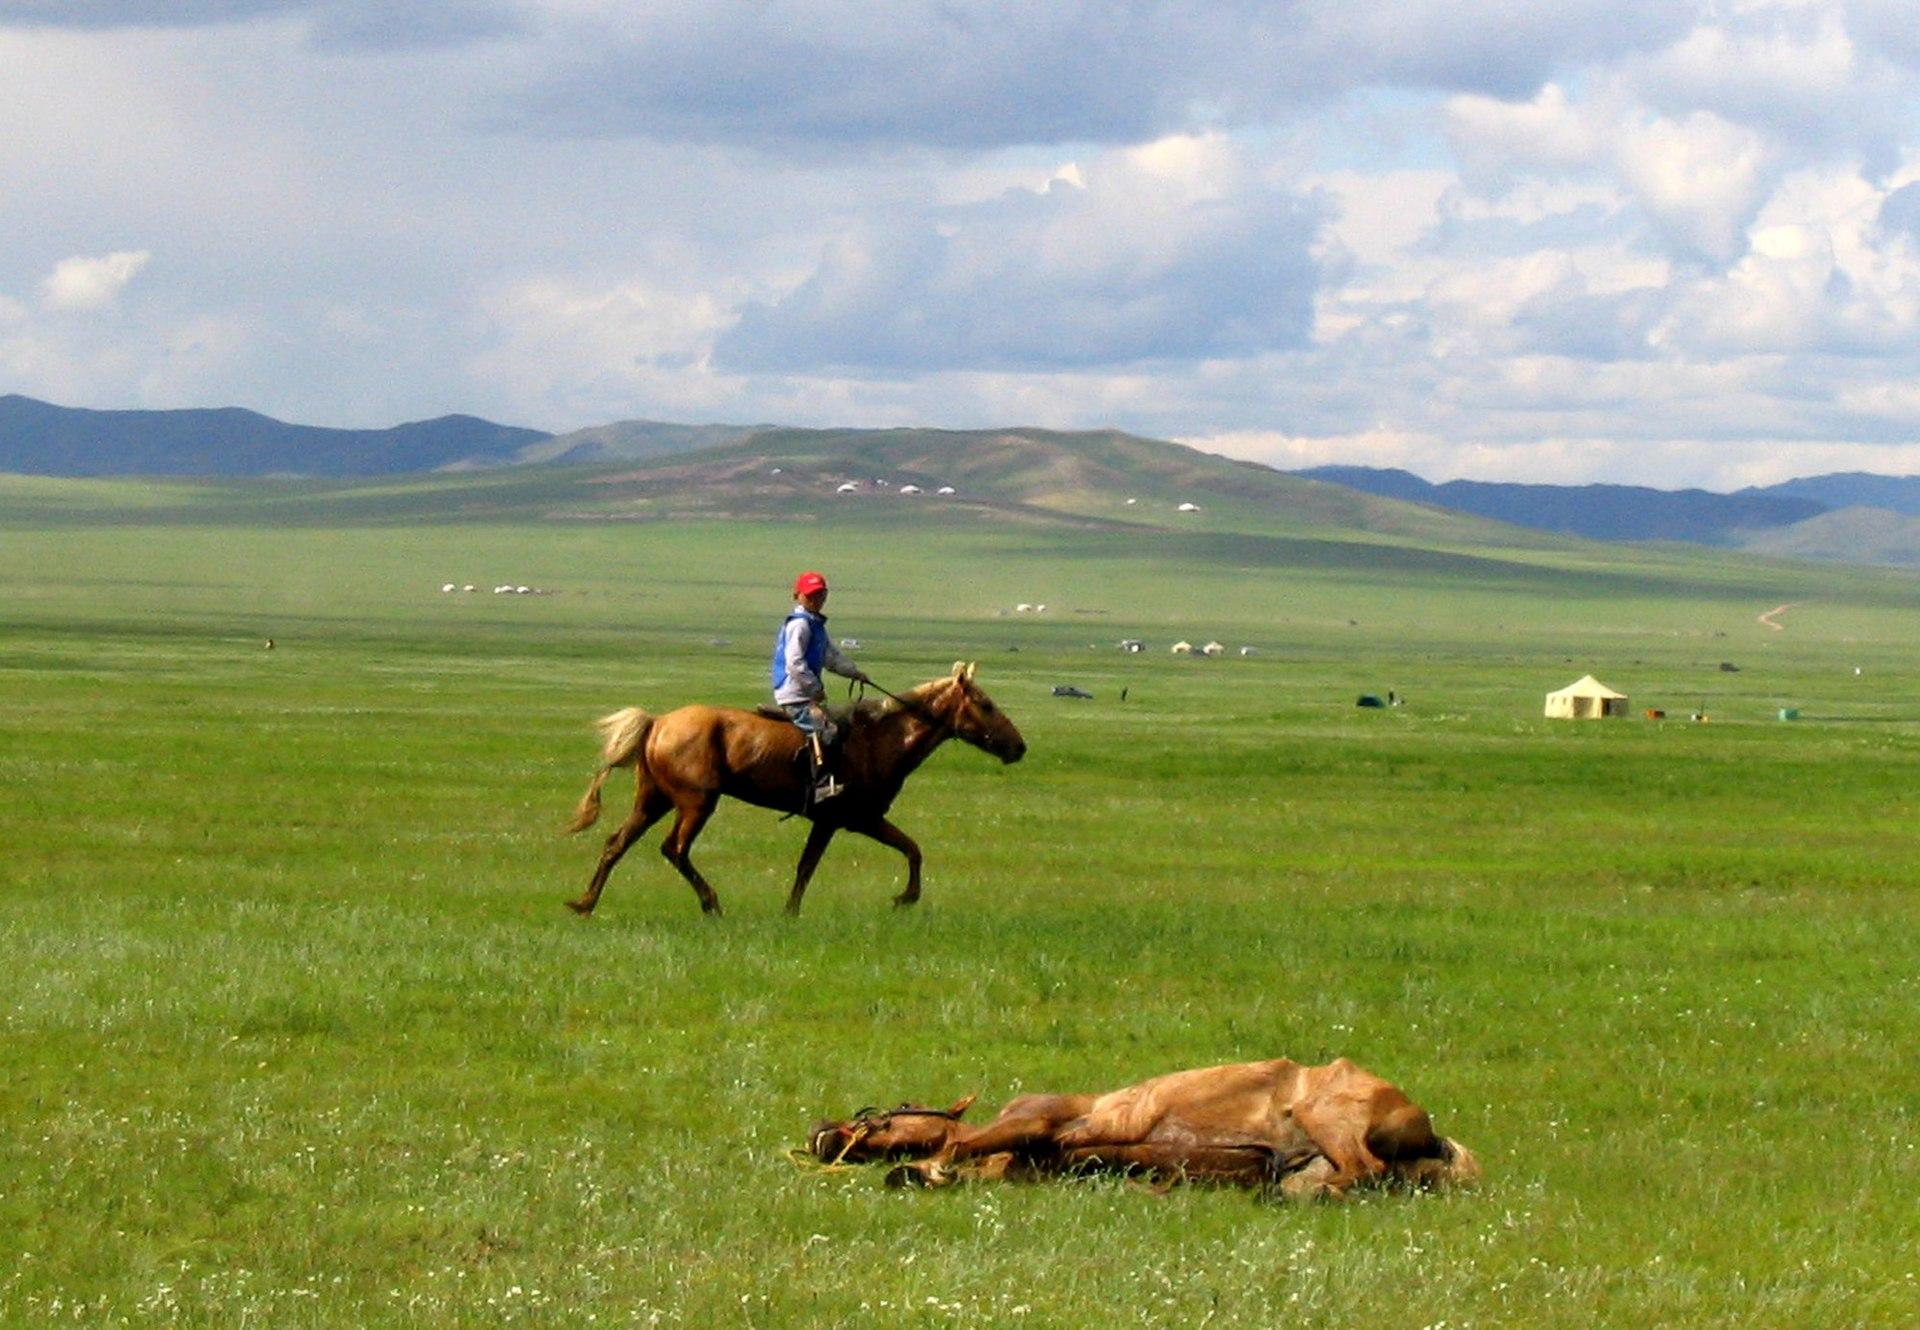 Caballo mongol - Horse Scanner